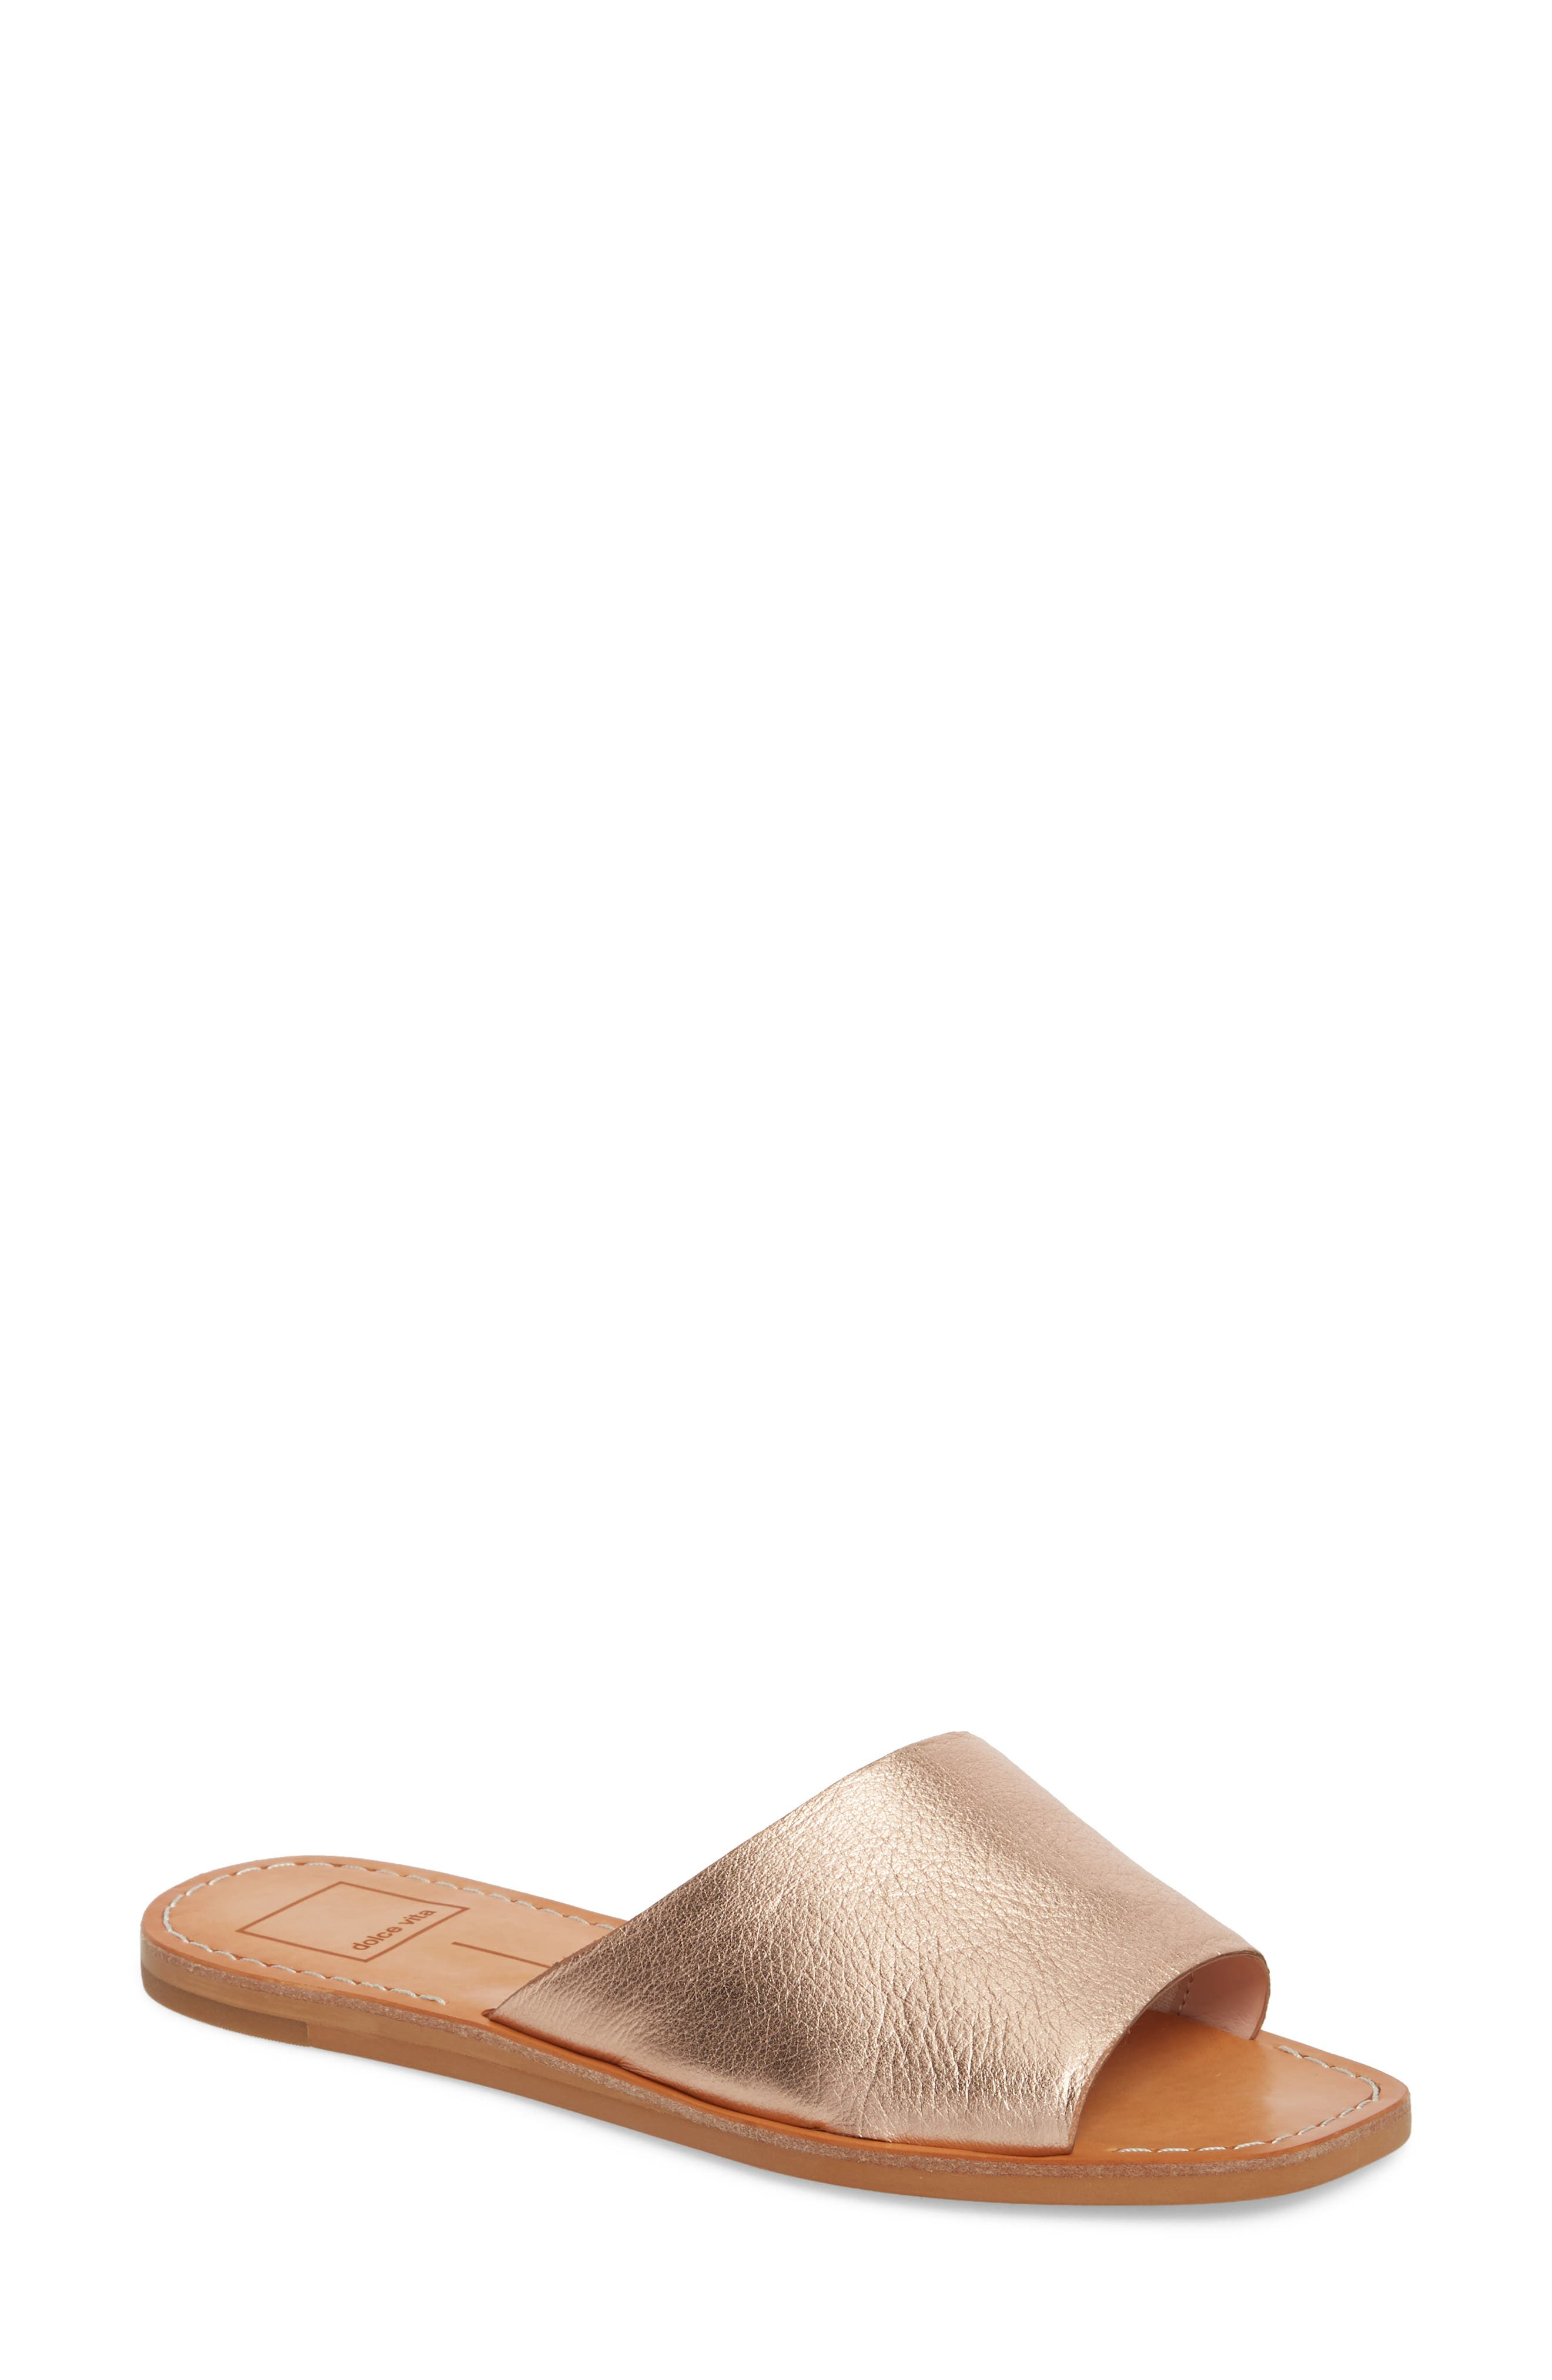 Cato Genuine Calf Hair Slide Sandal,                             Main thumbnail 4, color,